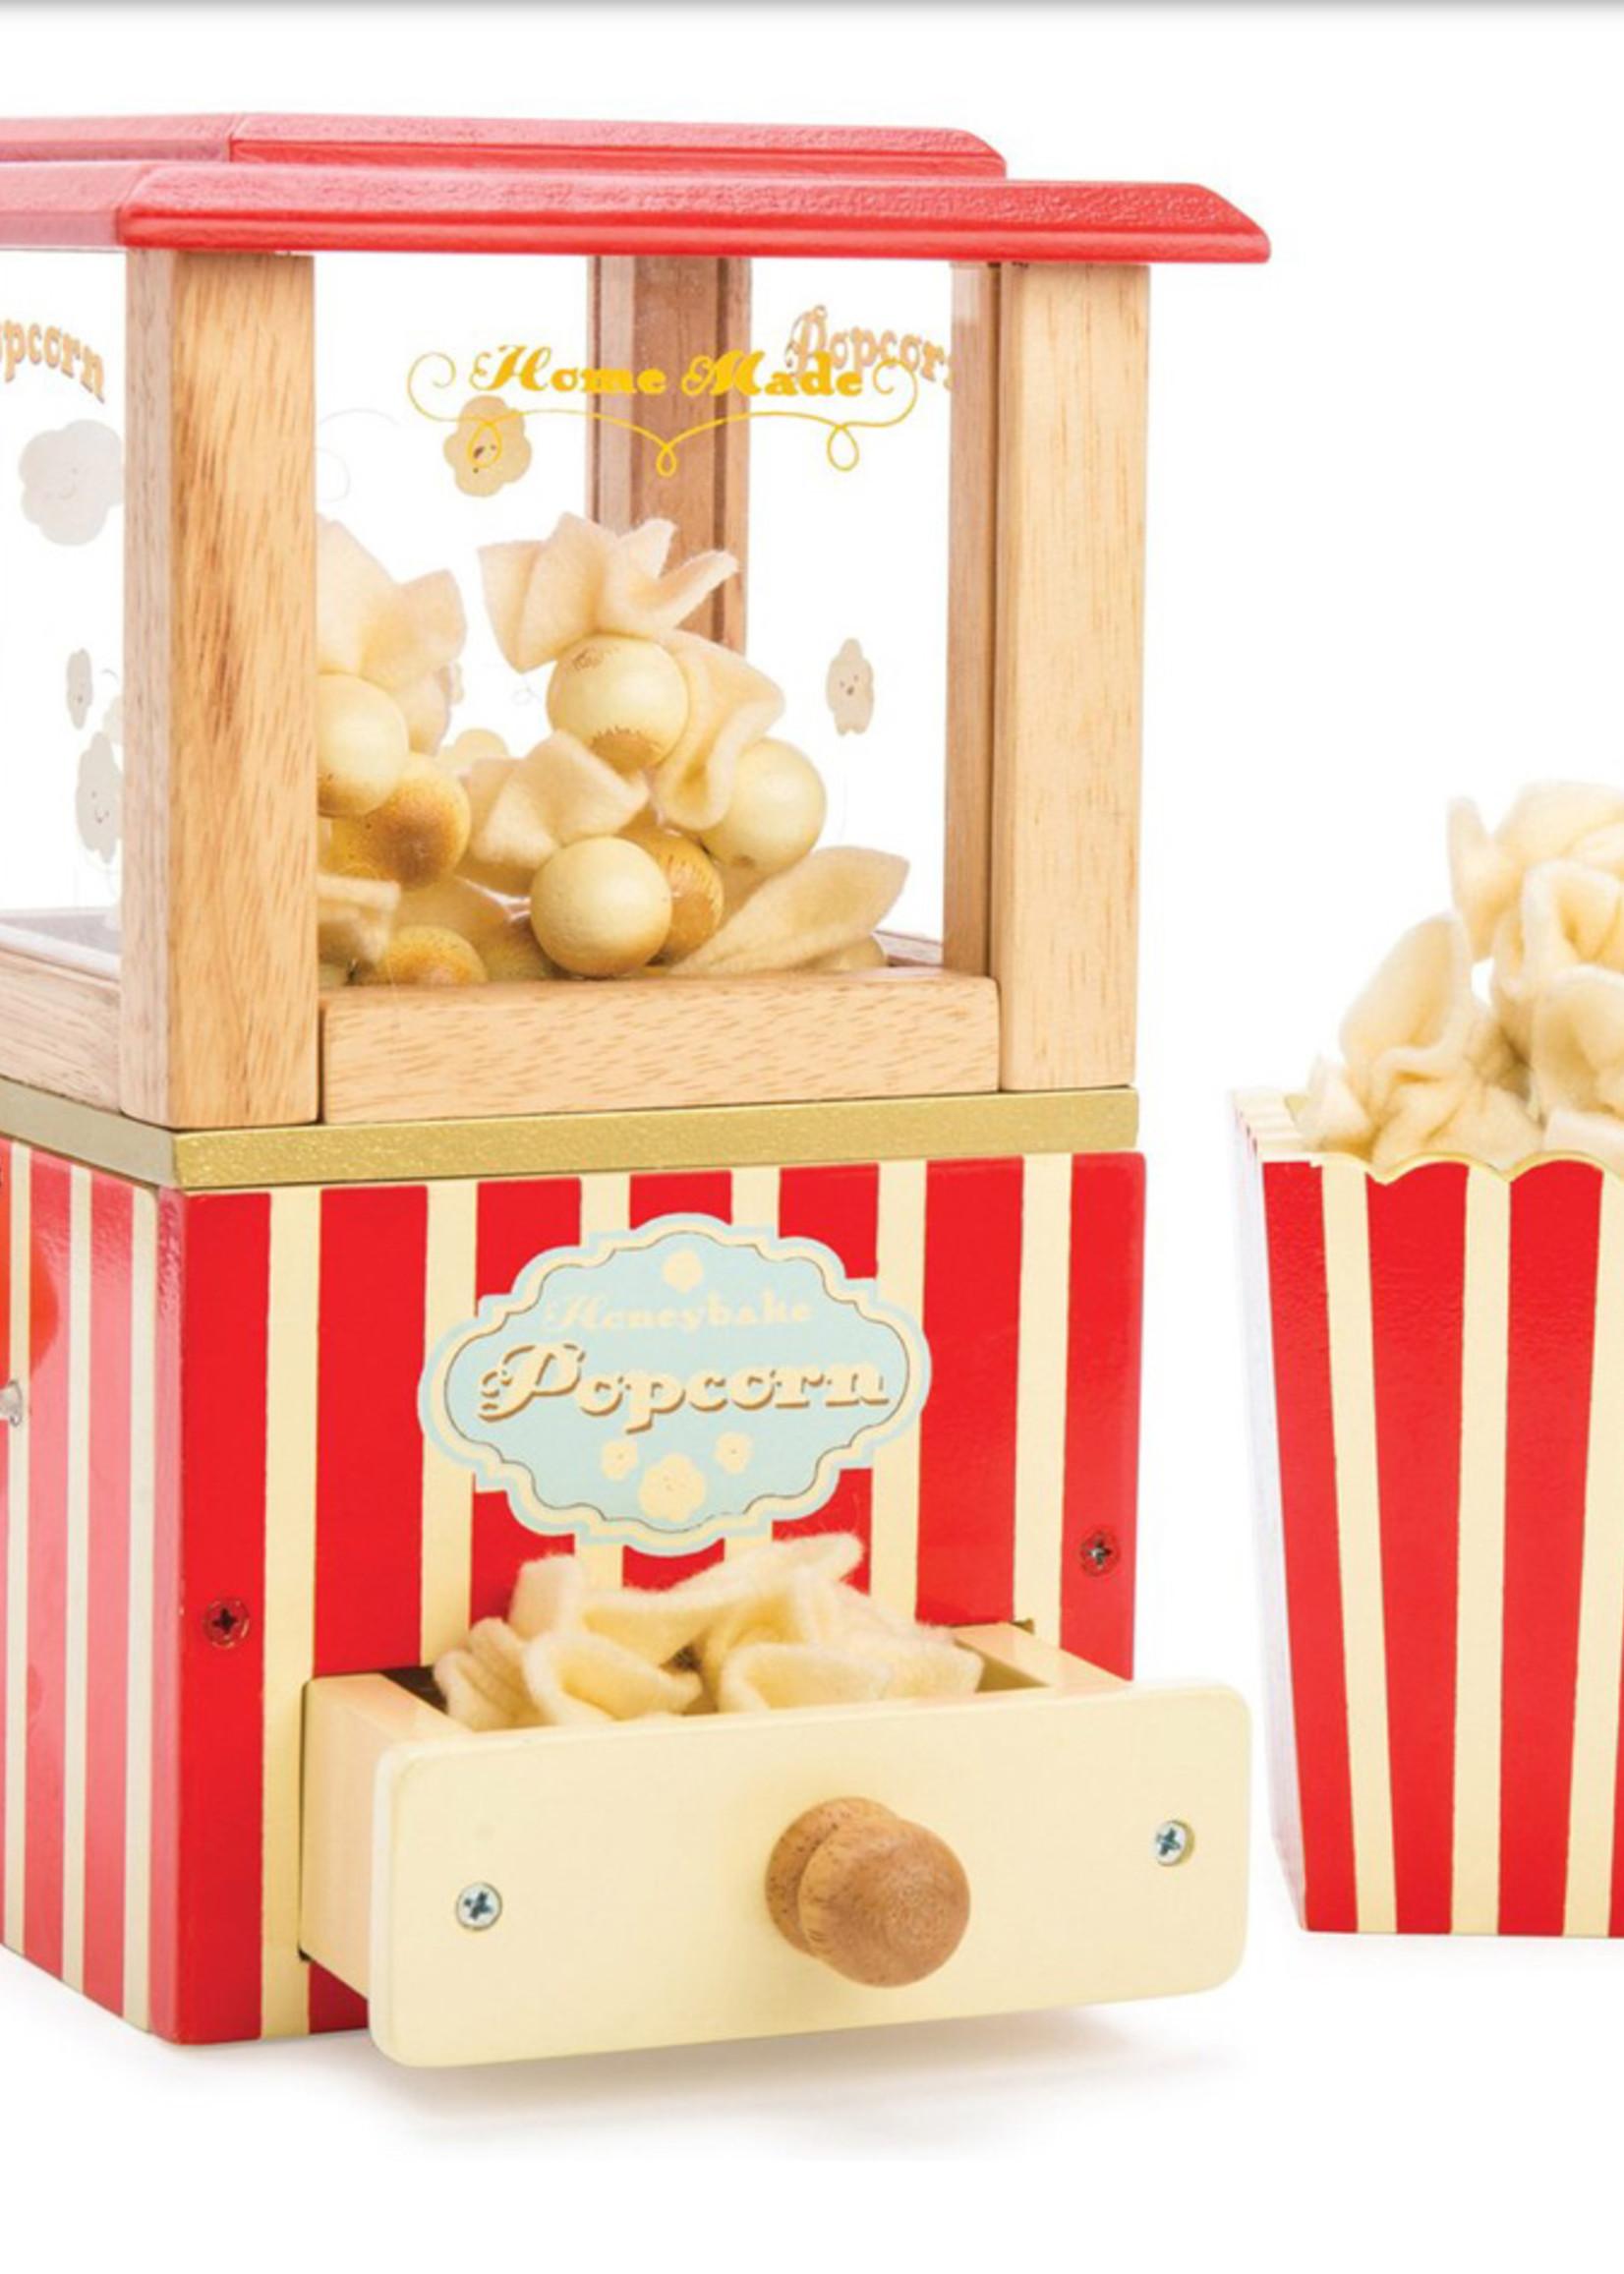 Letoy van Popcorn machine